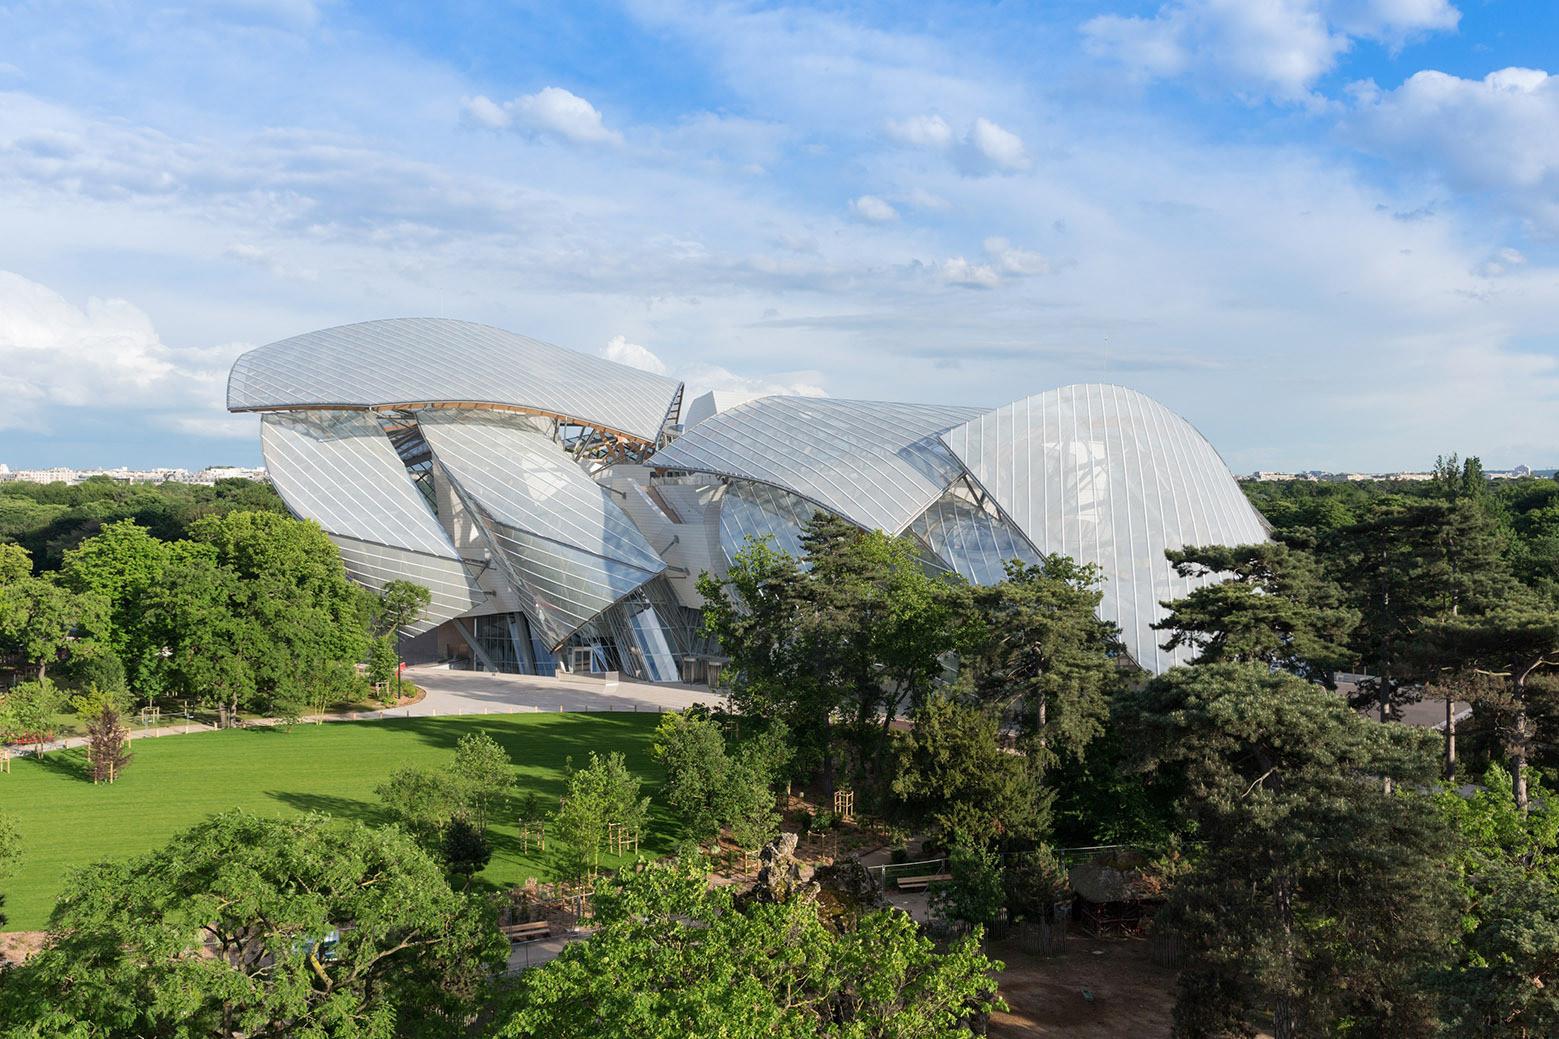 Fundación Louis Vuitton / Gehry Partners. Imagen © Iwan Baan